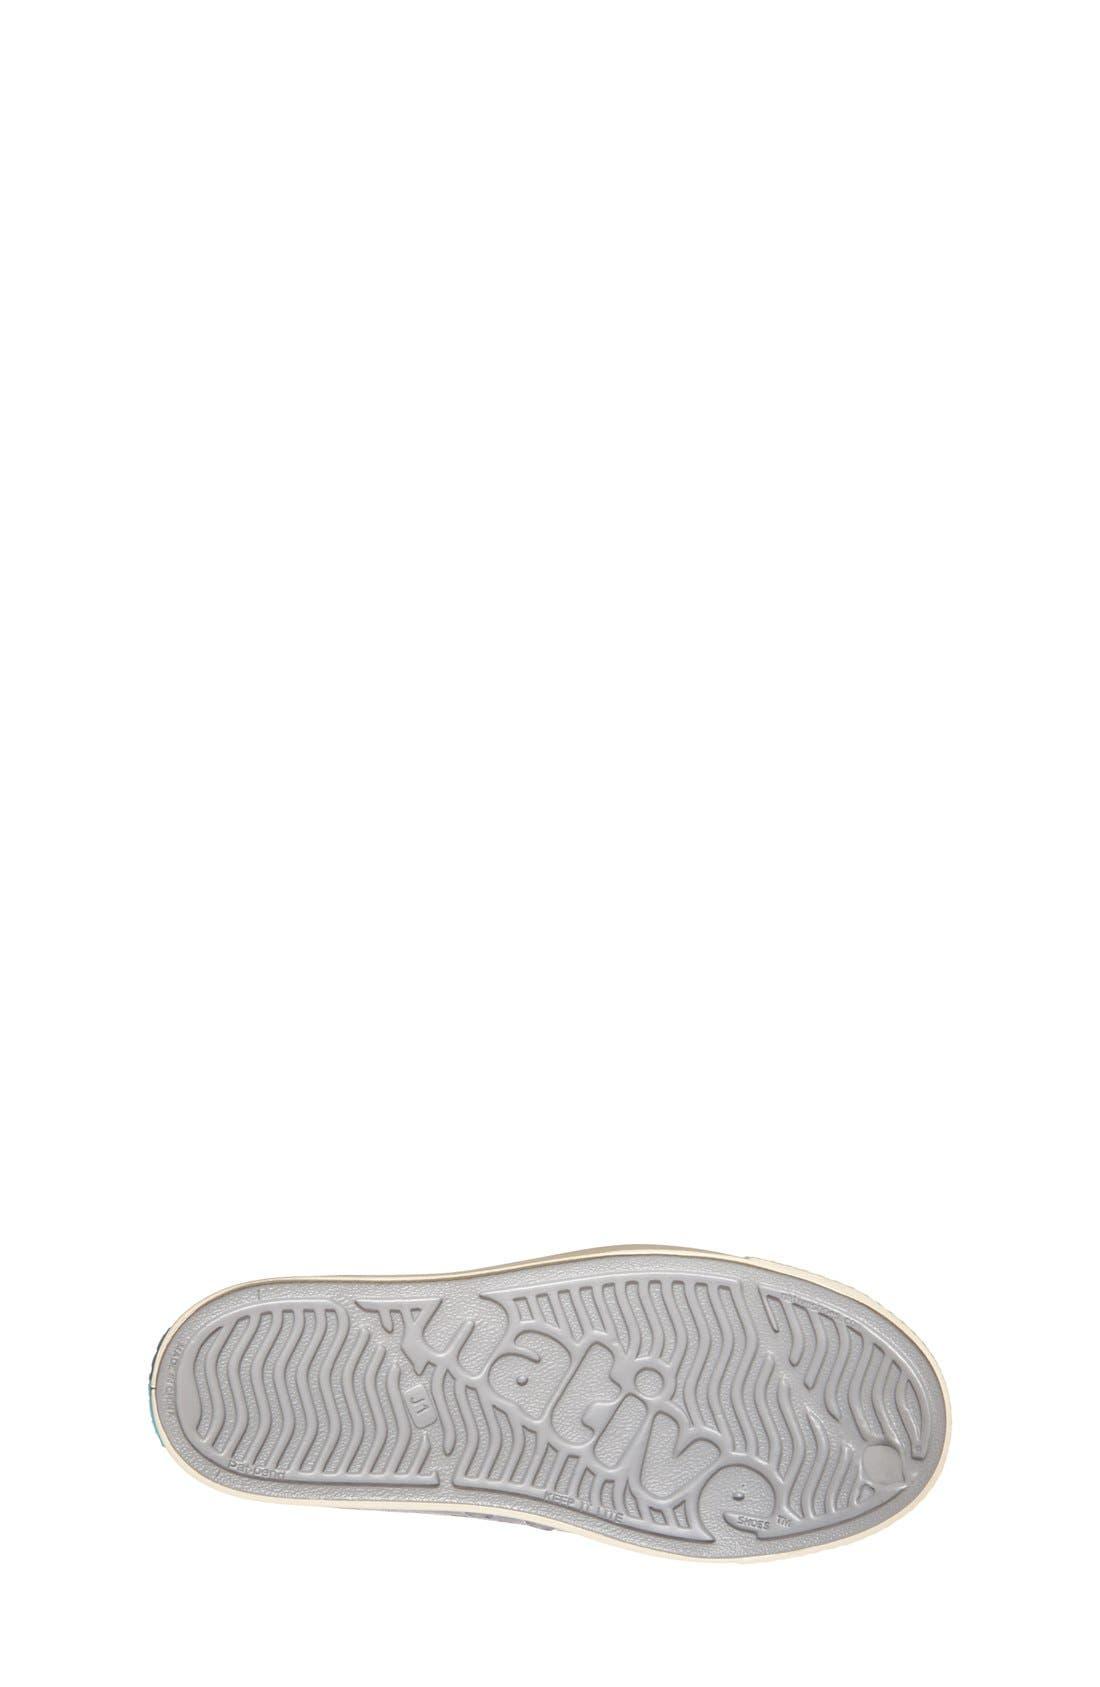 'Jefferson' Water Friendly Slip-On Sneaker,                             Alternate thumbnail 191, color,